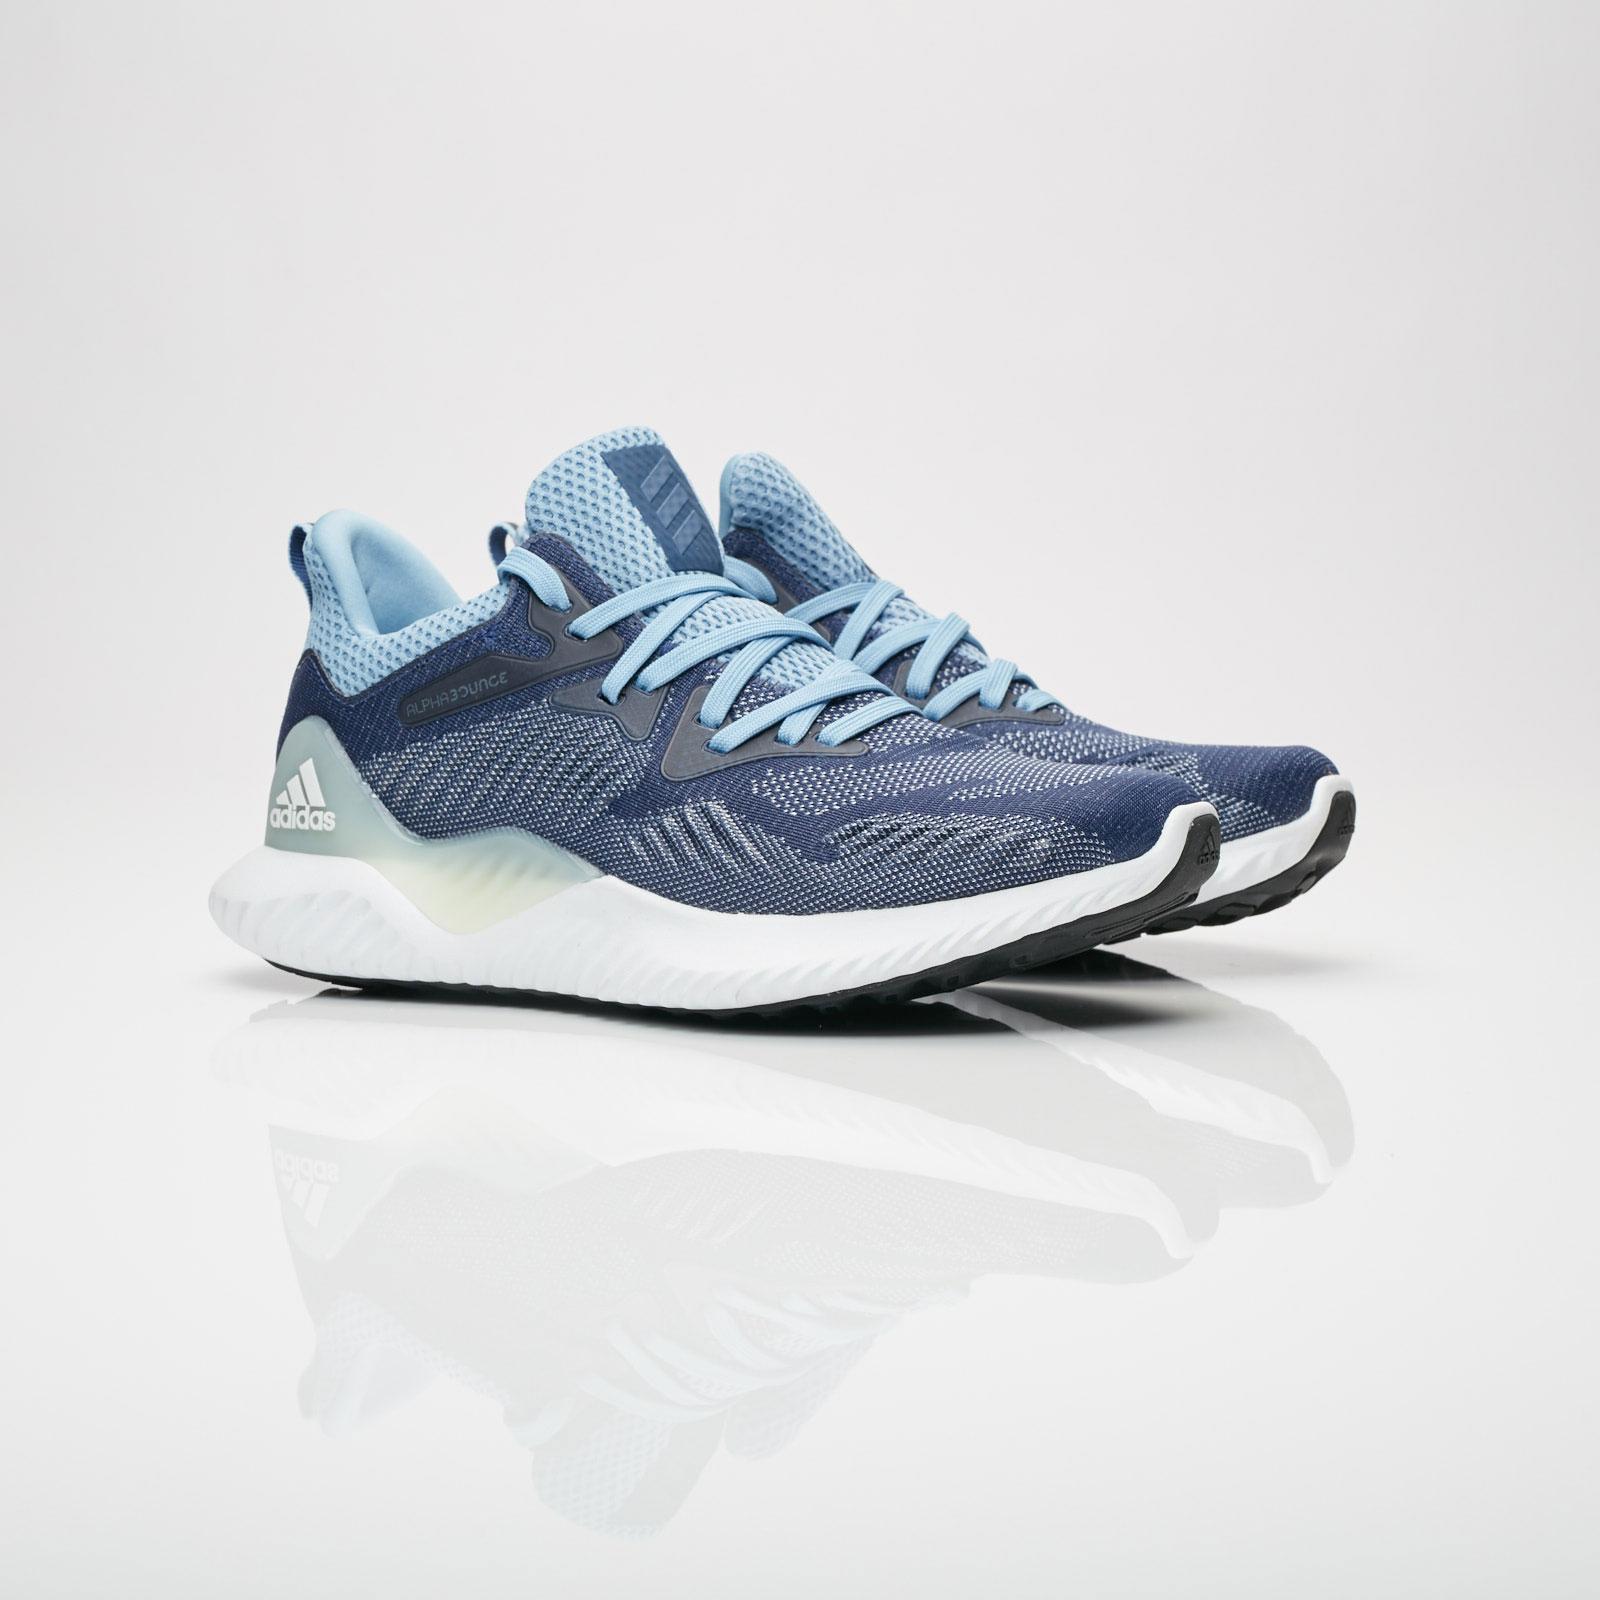 6ebfce96efba3b adidas Alphabounce 2 W - Db0205 - Sneakersnstuff